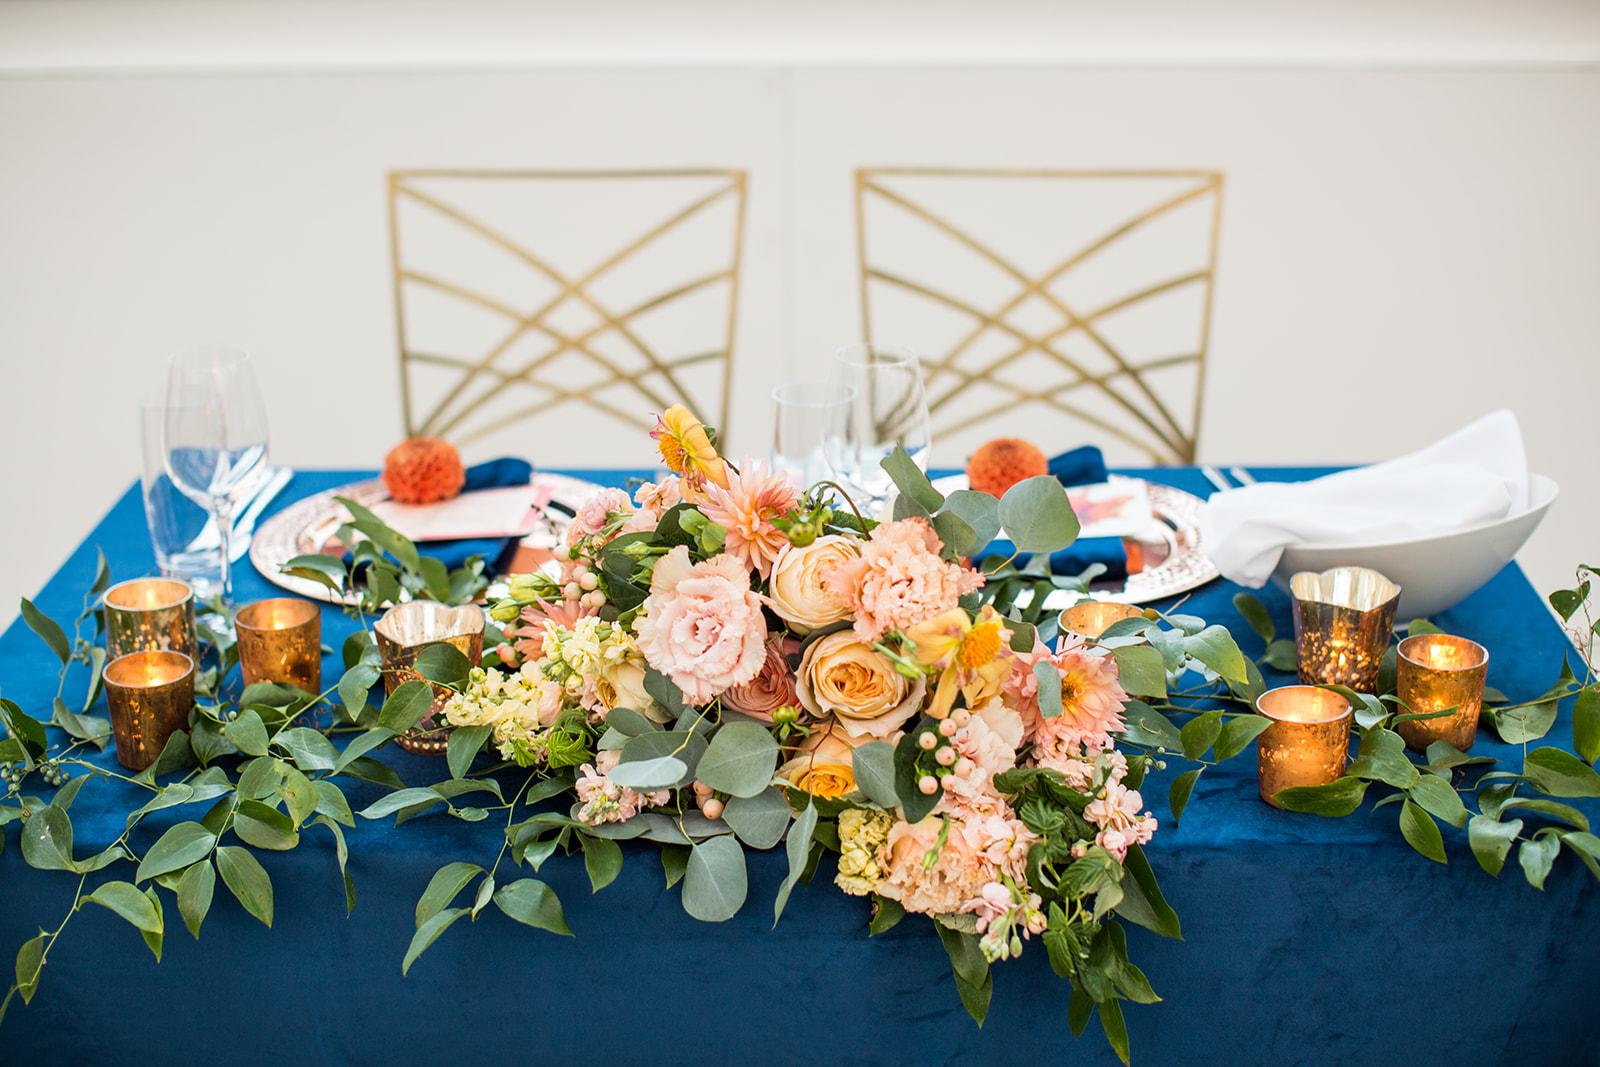 Low floral centerpiece with local dahlias, roses and eucalyptus on navy velvet linens for a fall wedding reception | Flora Nova Design Seattle